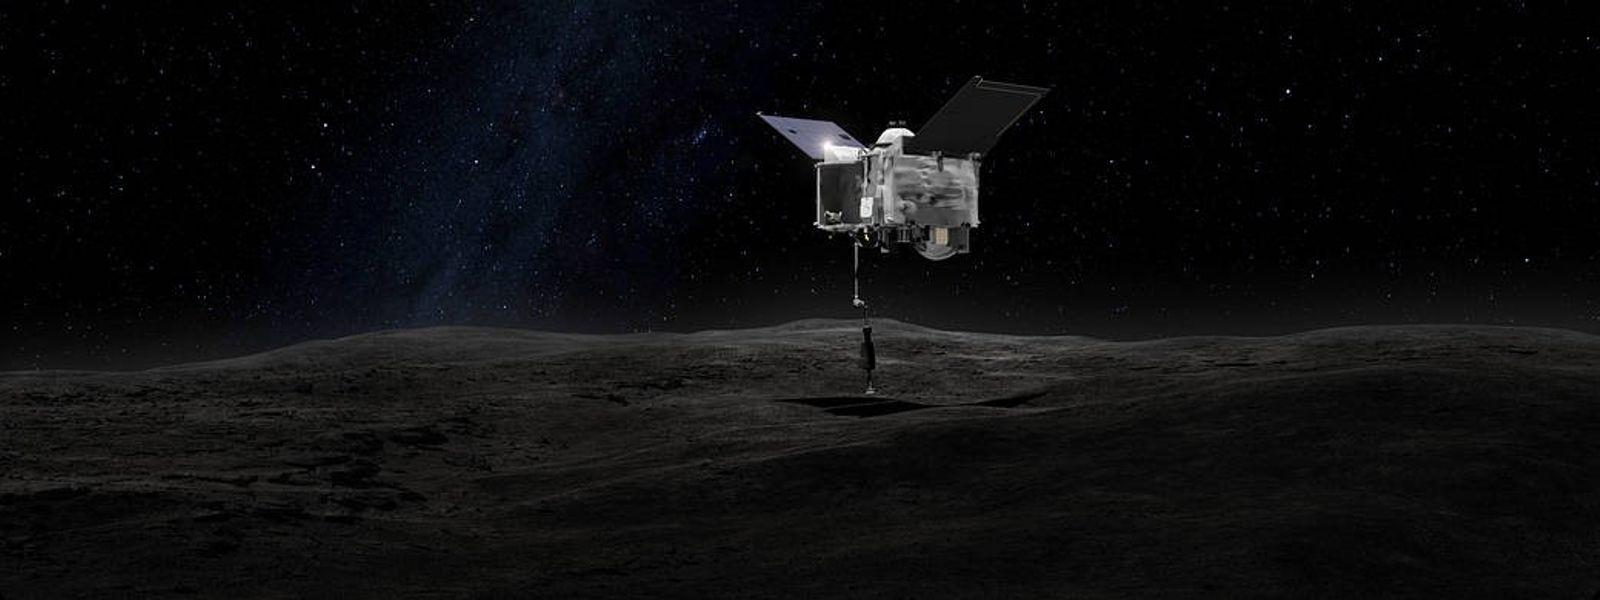 The Origins Spectral Interpretation Resource Identification Security - Regolith Explorer (OSIRIS-REx) spacecraft contacting the asteroid Bennu. ...